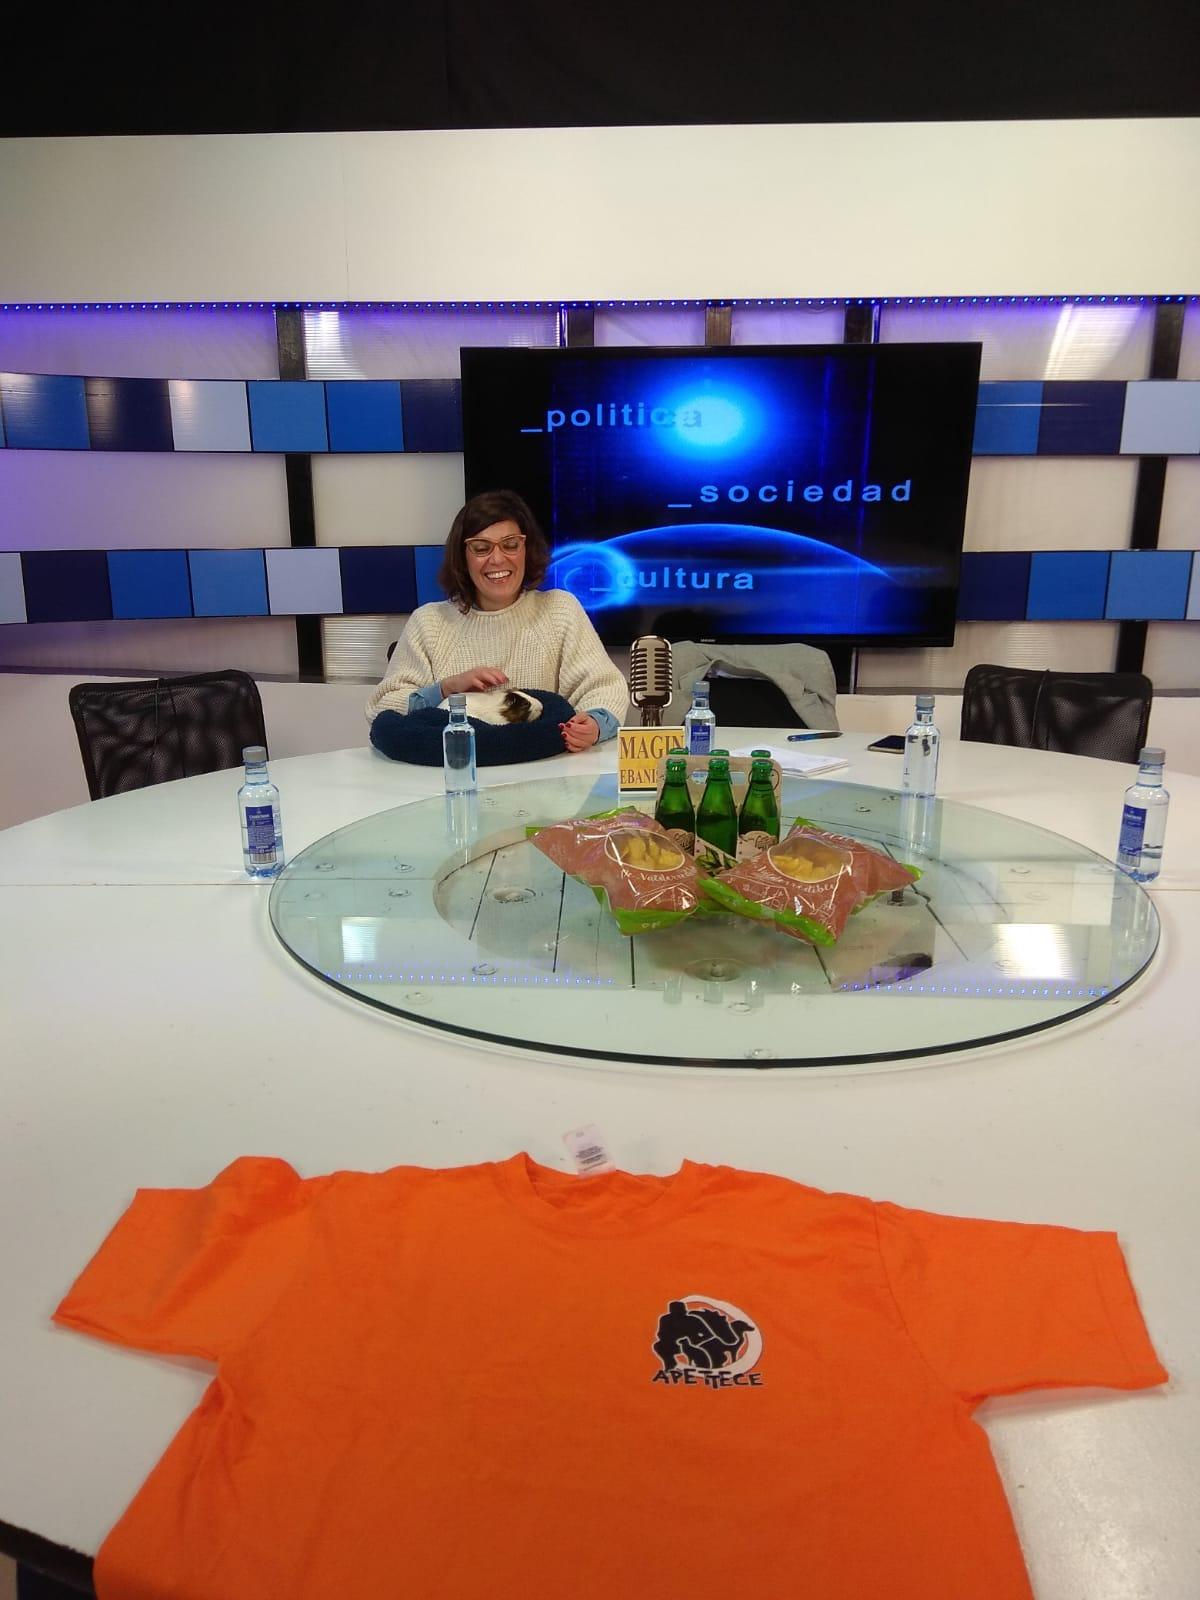 Veronica yb Tukupi en TV